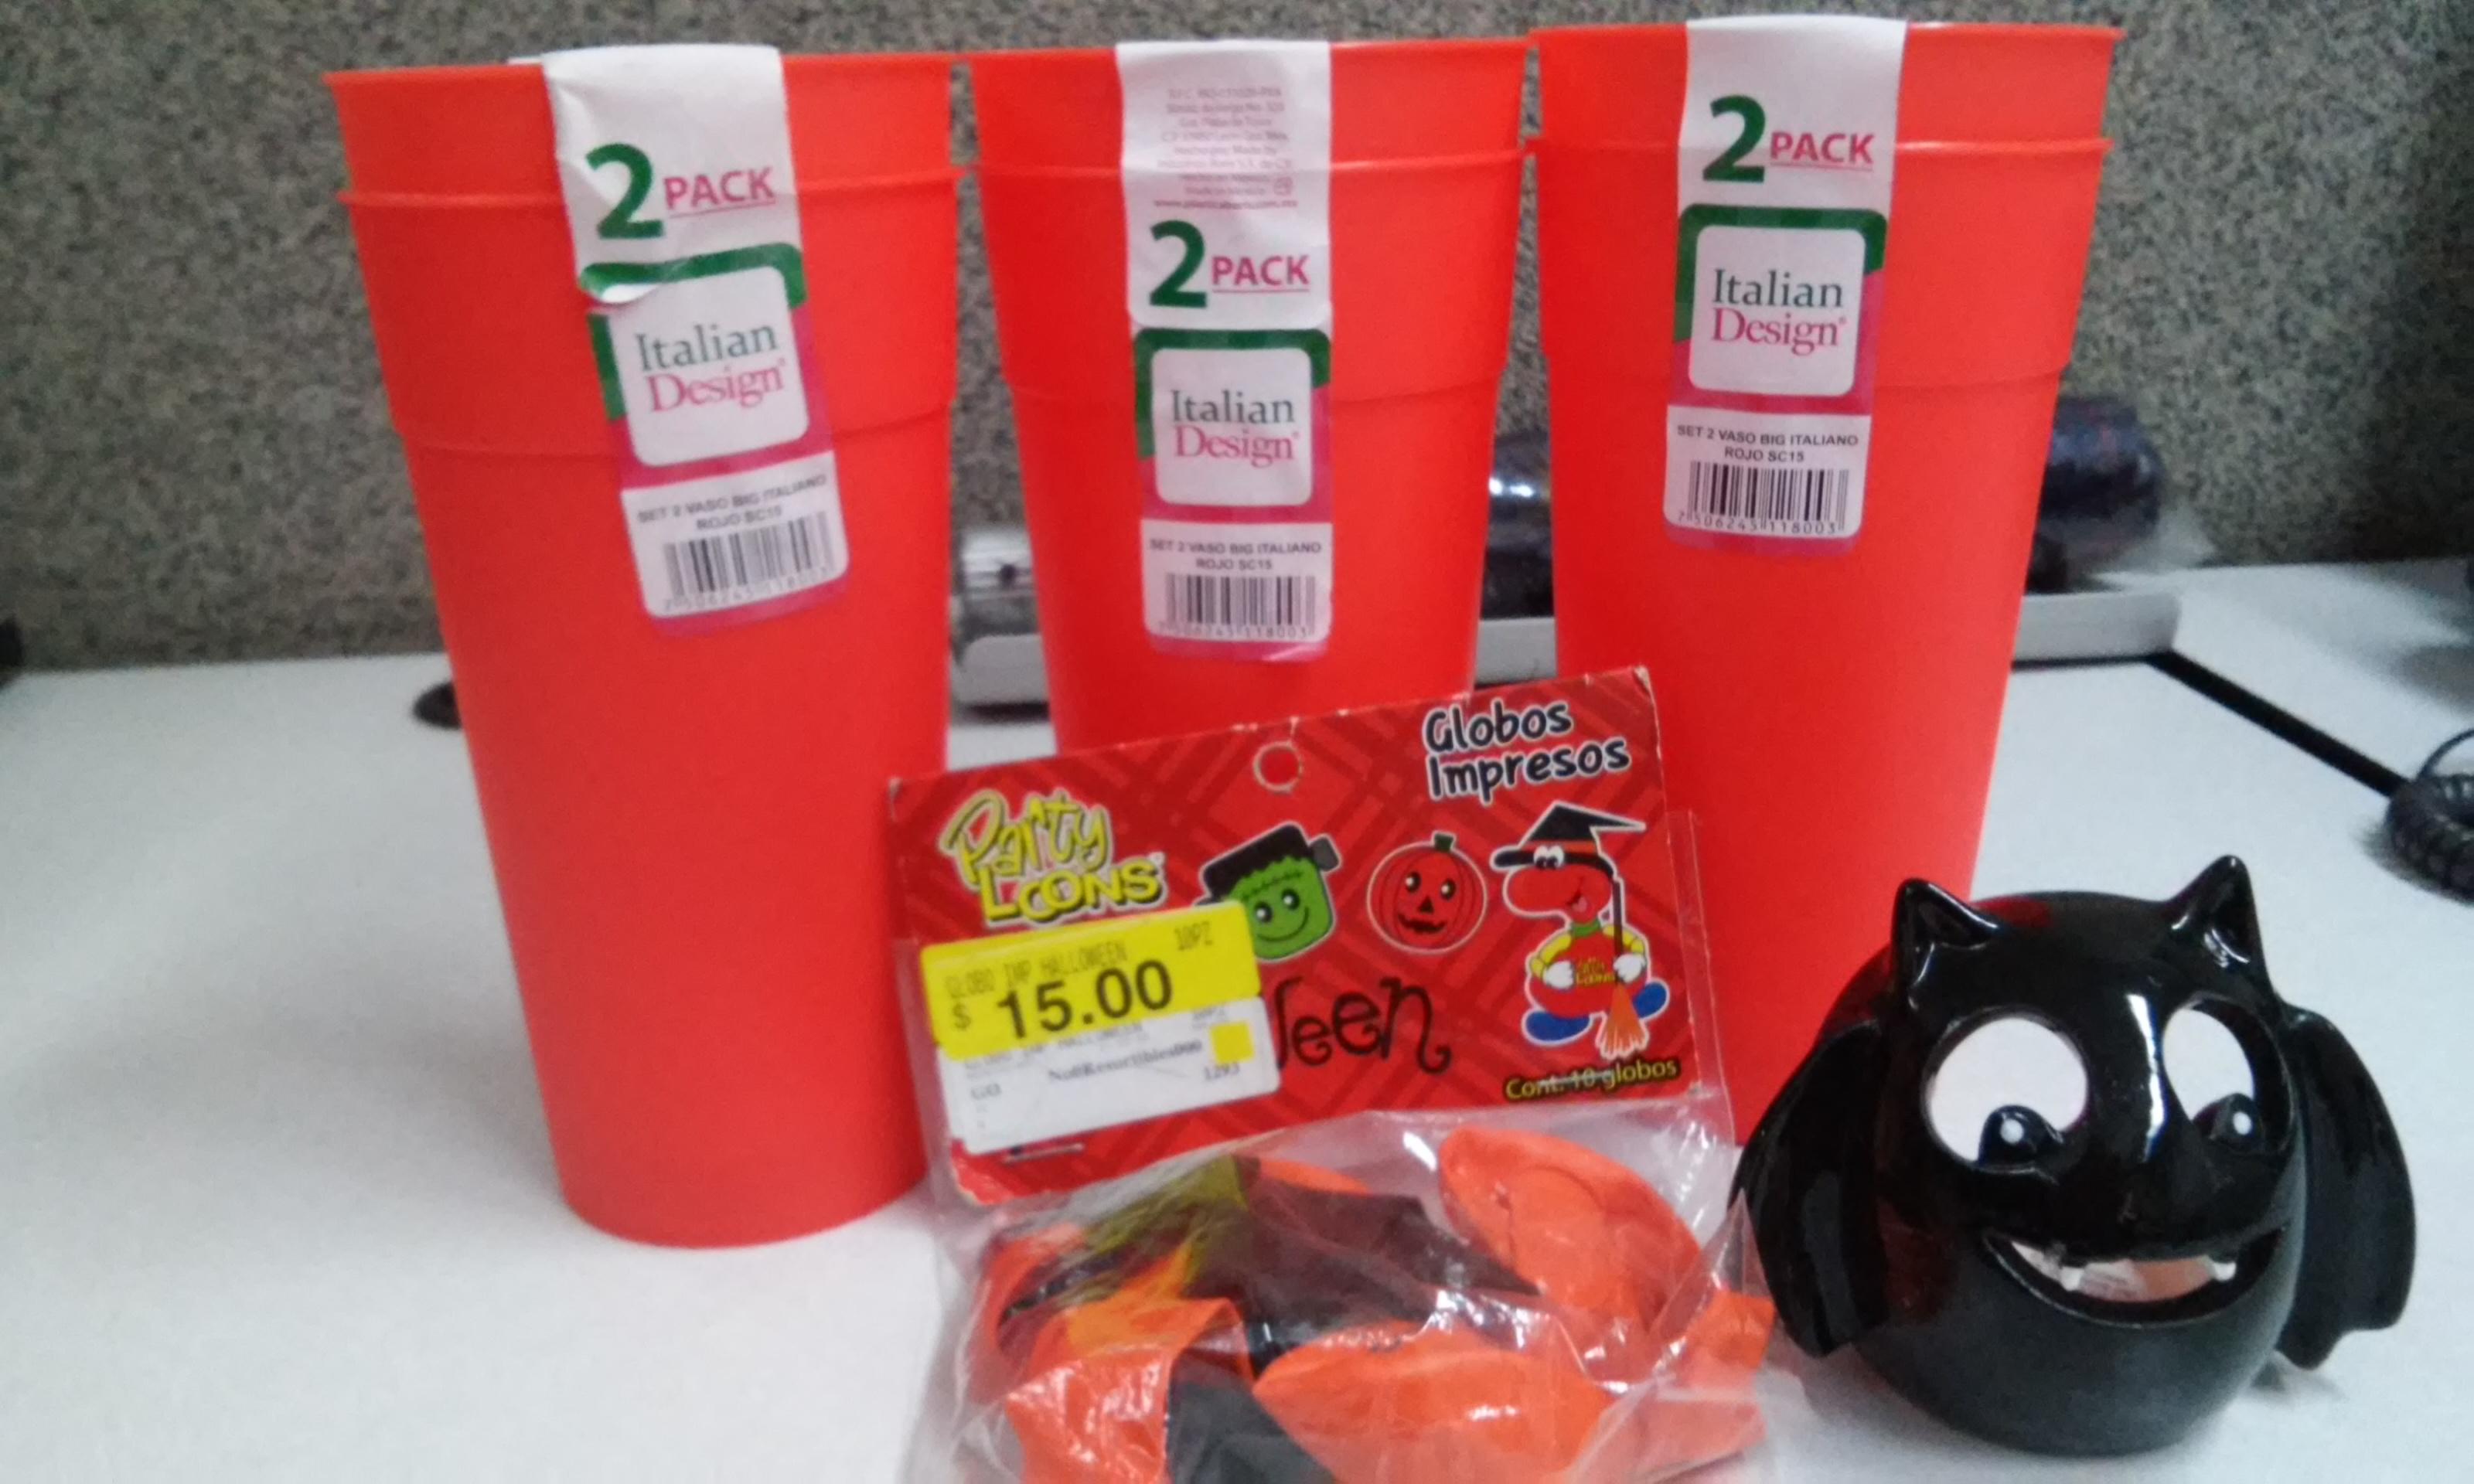 Walmart Cuitlahuac: Set de 2 vasos diseño italiano $3.01